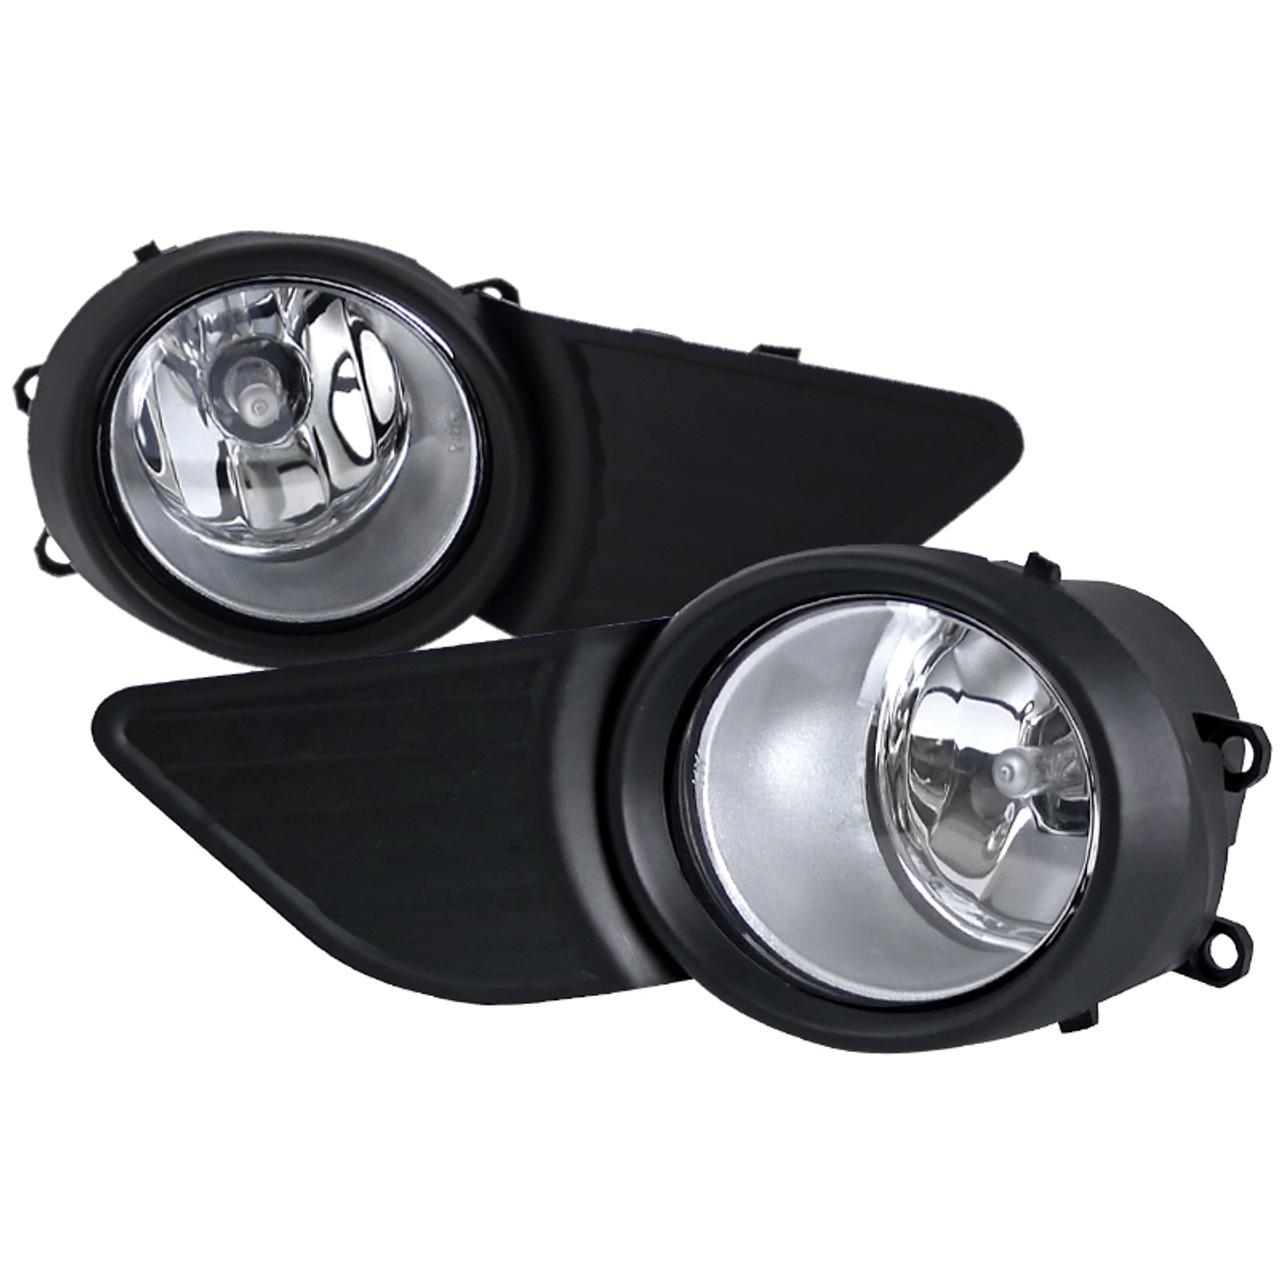 Fog Light Trim Set For 2011-2017 Toyota Sienna Left /& Right Black and Chrome 2Pc